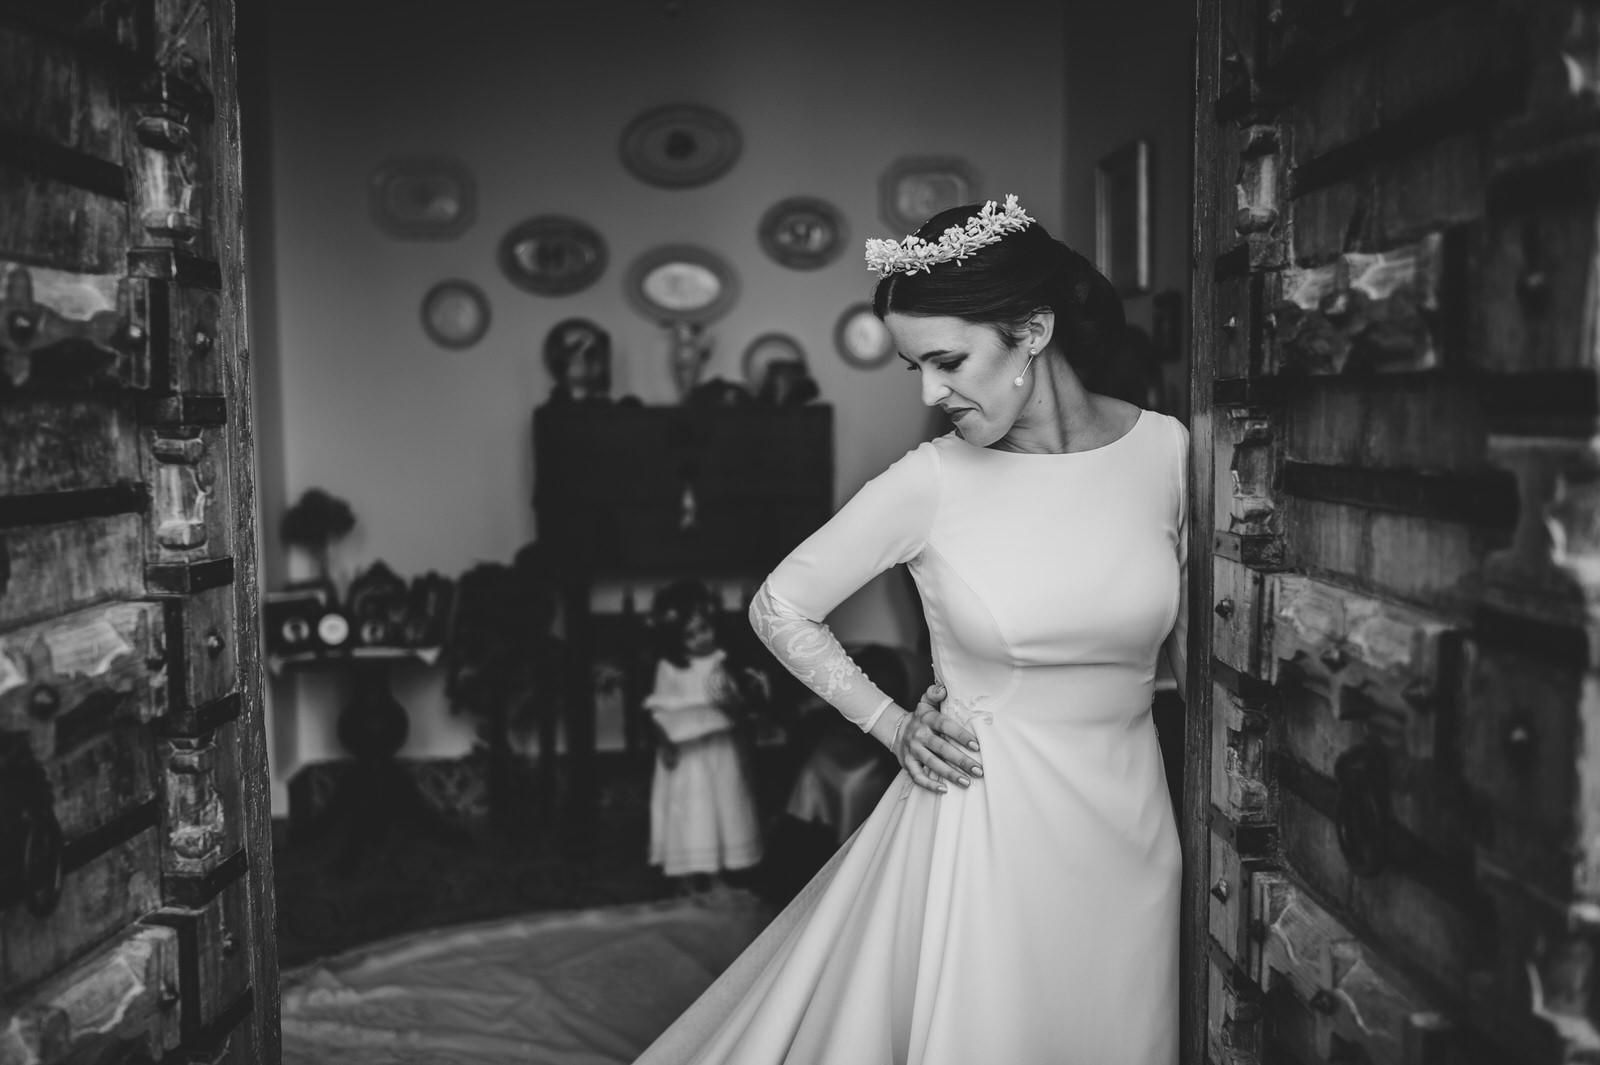 Judith & Gabriel - Boda en Olivares - Albaida, Fotógrafo de boda Andrés Amarillo - 16.JPG